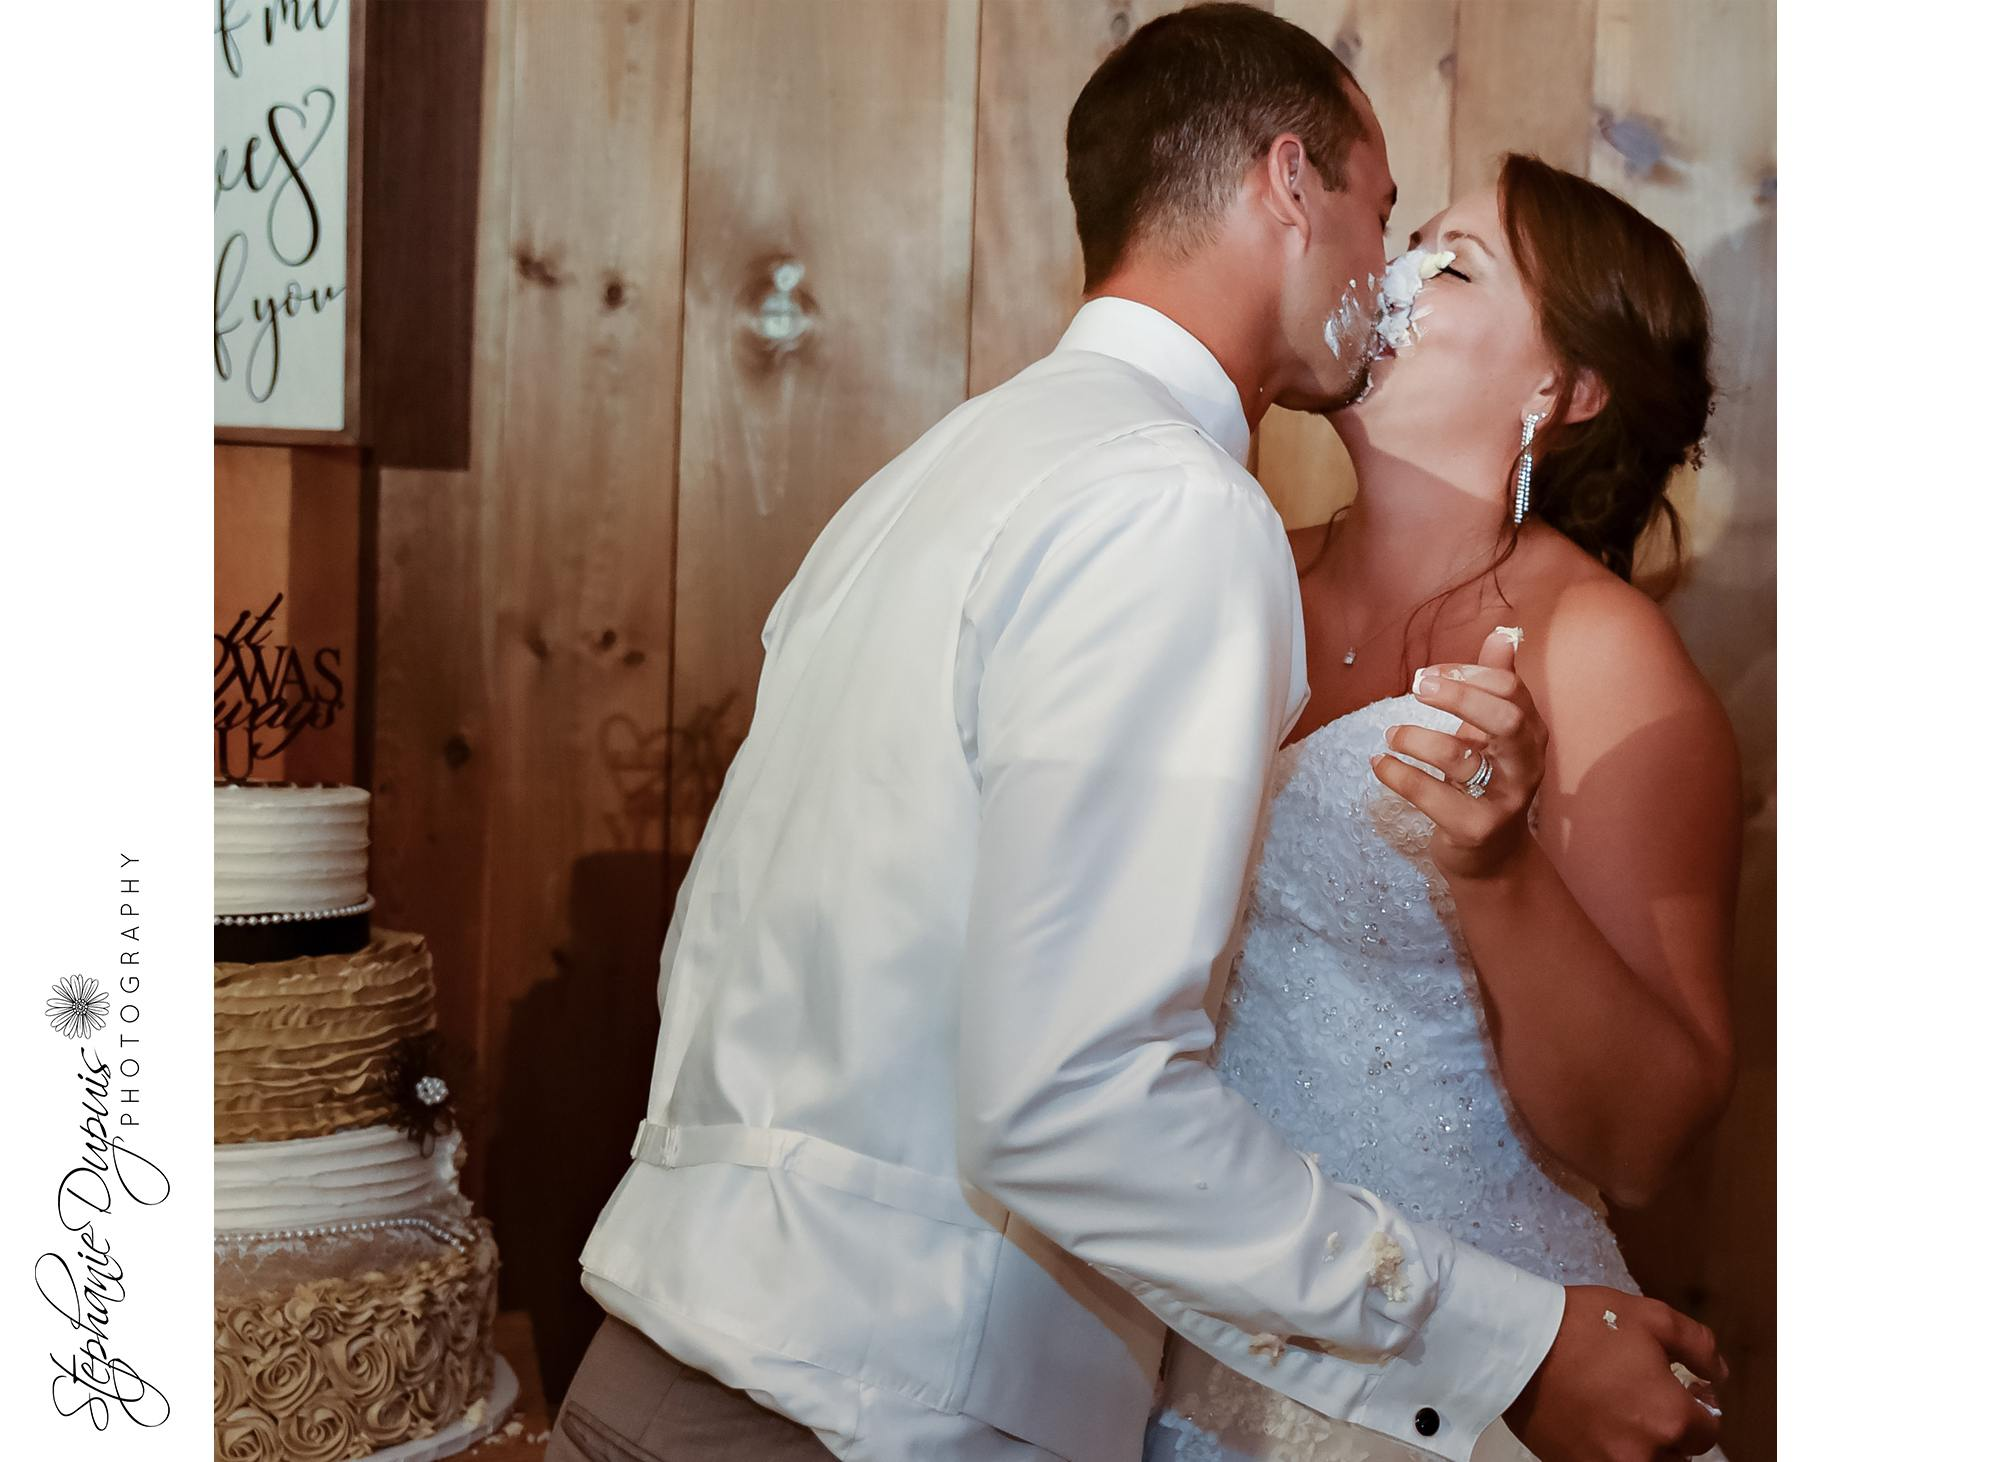 Whitefield Wedding Photographer 03 4 - Portfolio: Nason Wedding